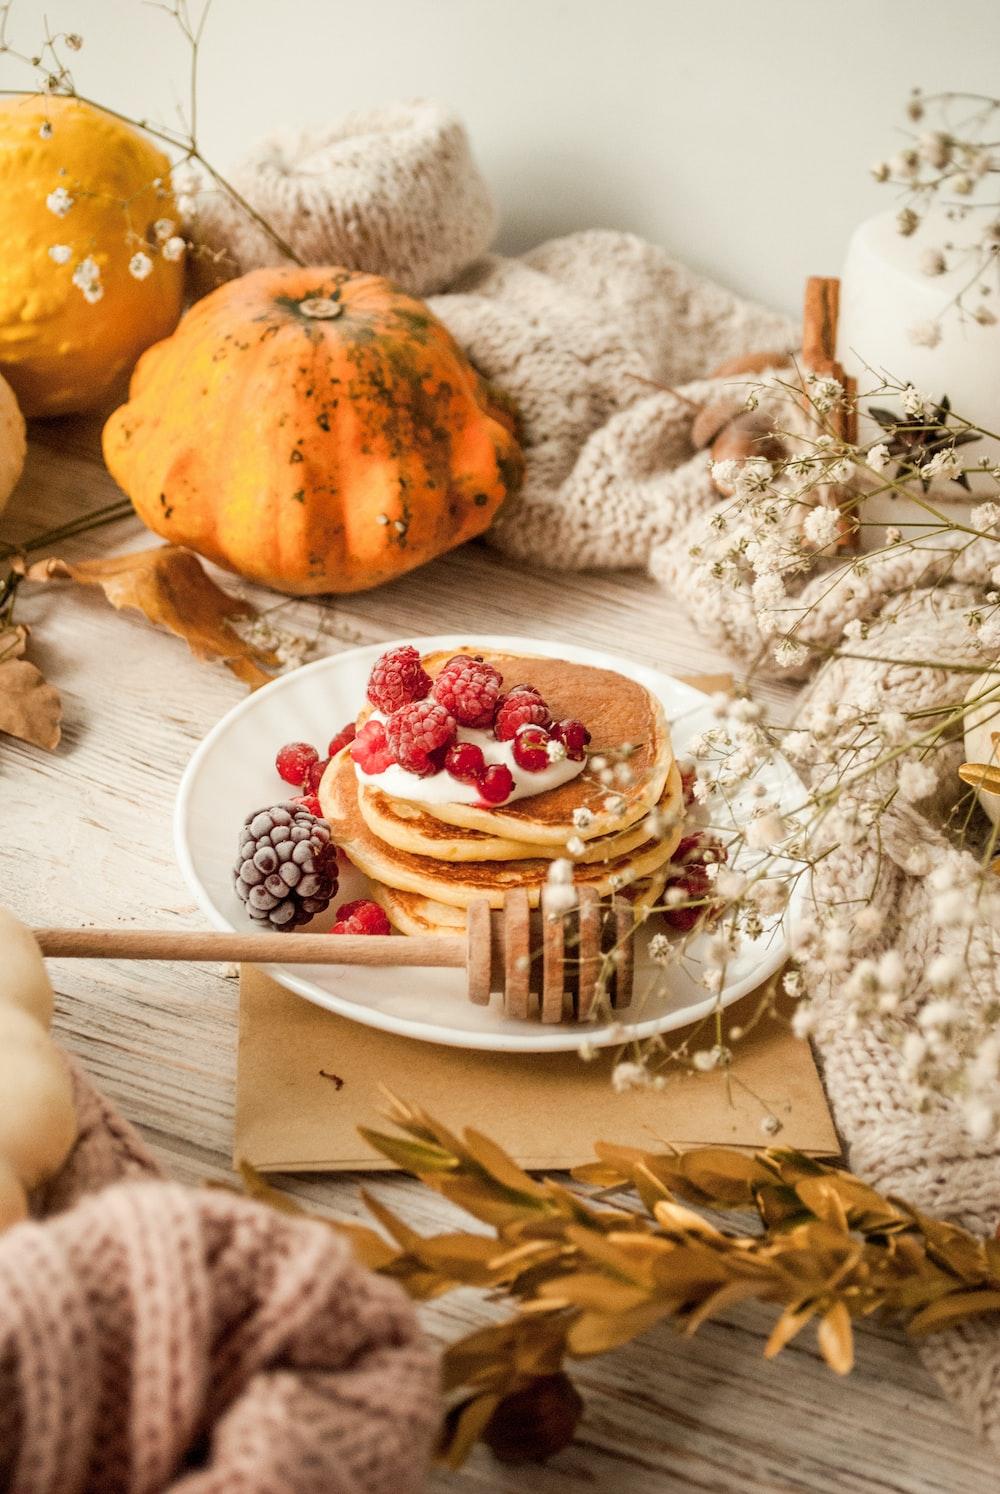 pancake with raspberries